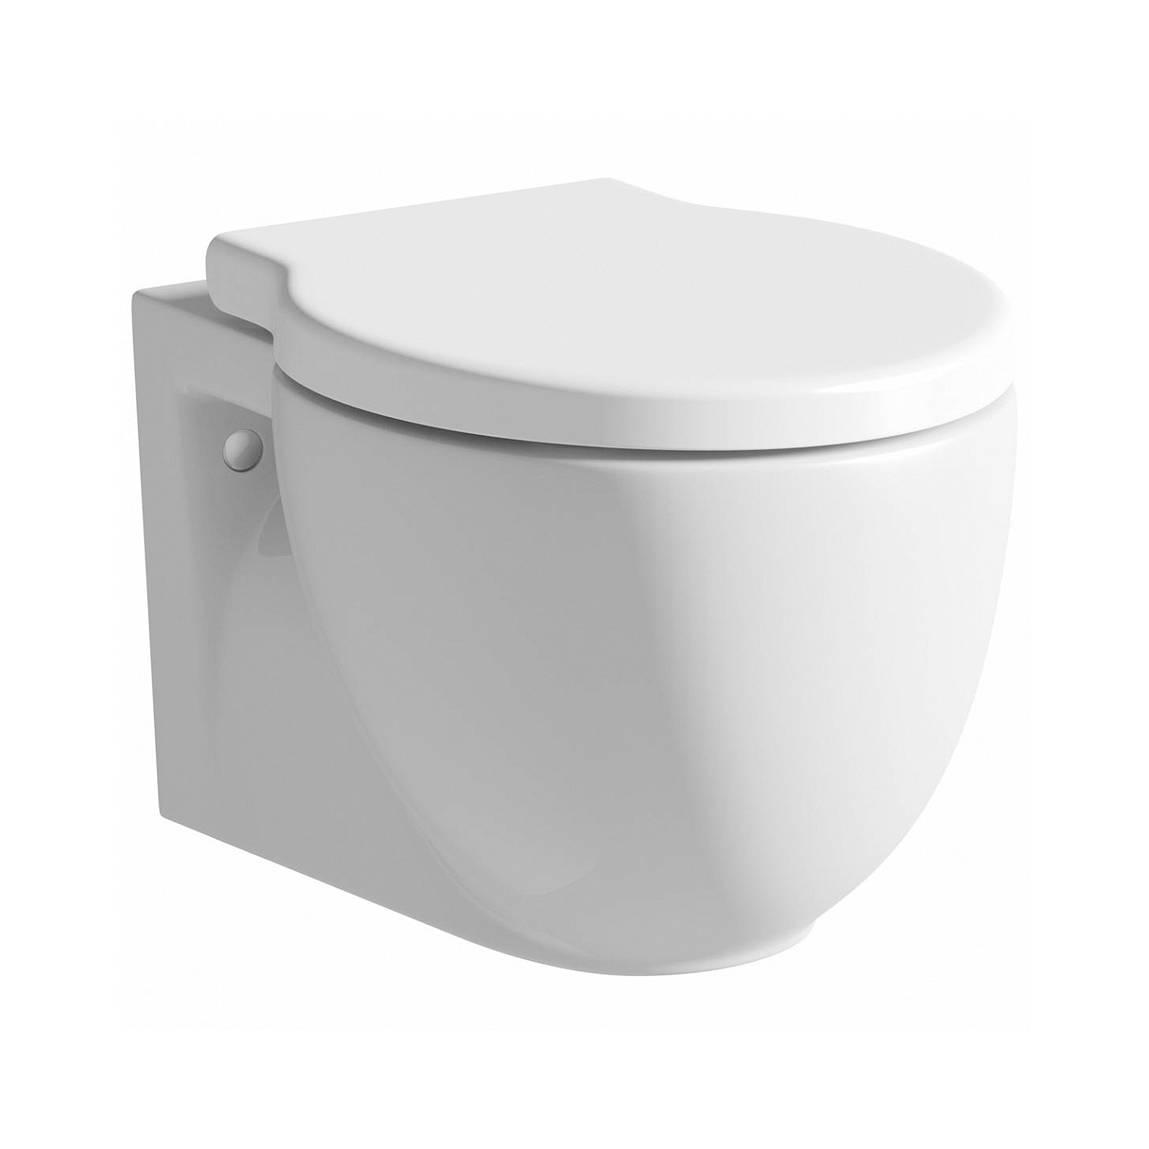 Image of Madison Wall Hung Toilet inc Luxury Soft Close Seat